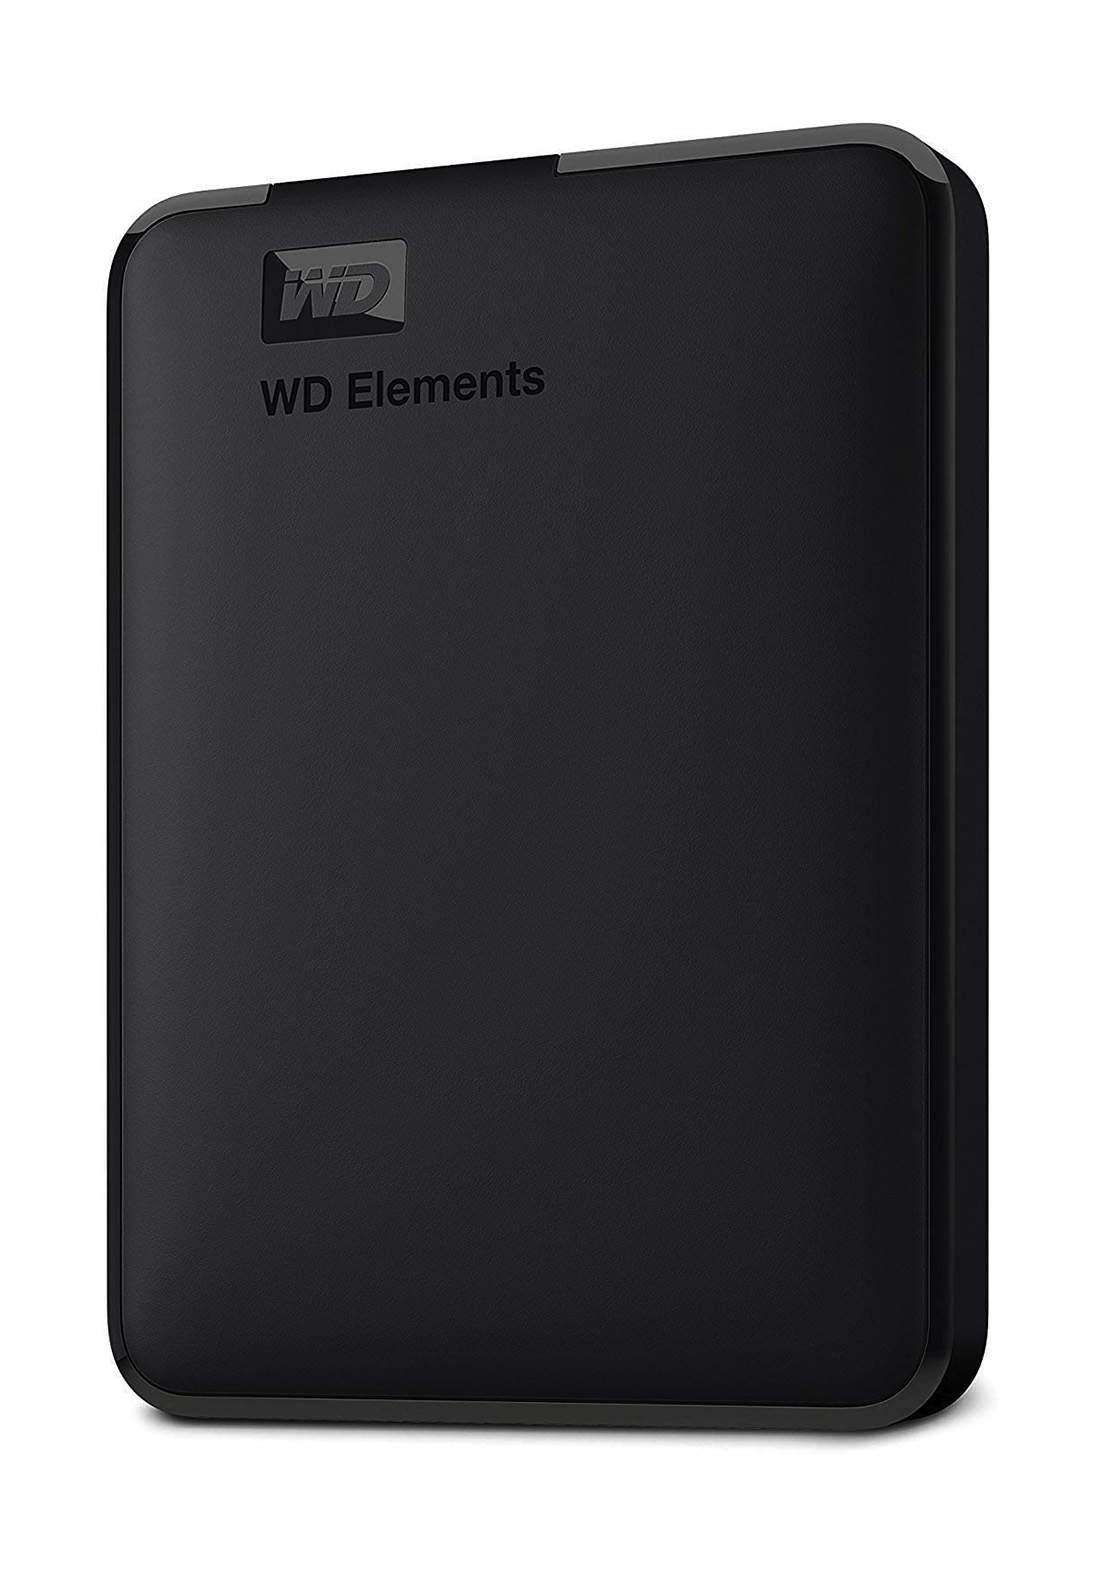 WD Elements 1TB Portable USB 3.0 External Hard Drive - Black هارد خارجي محمول